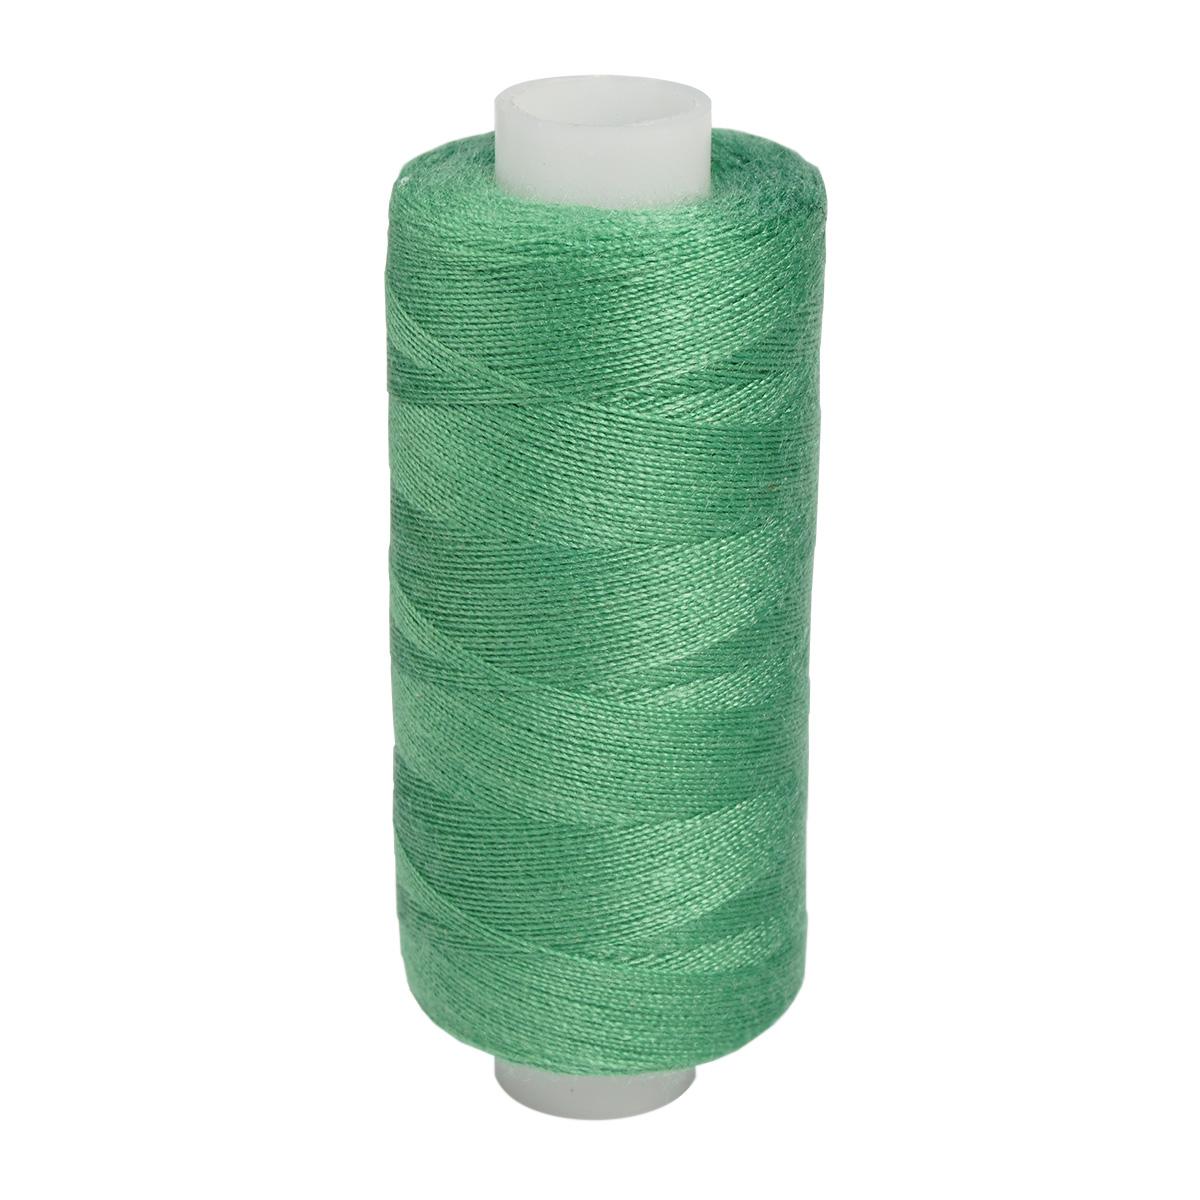 Нитки, 40/2, 400 ярд., 100% полиэстер, Bestex (132 св.зеленый) фото